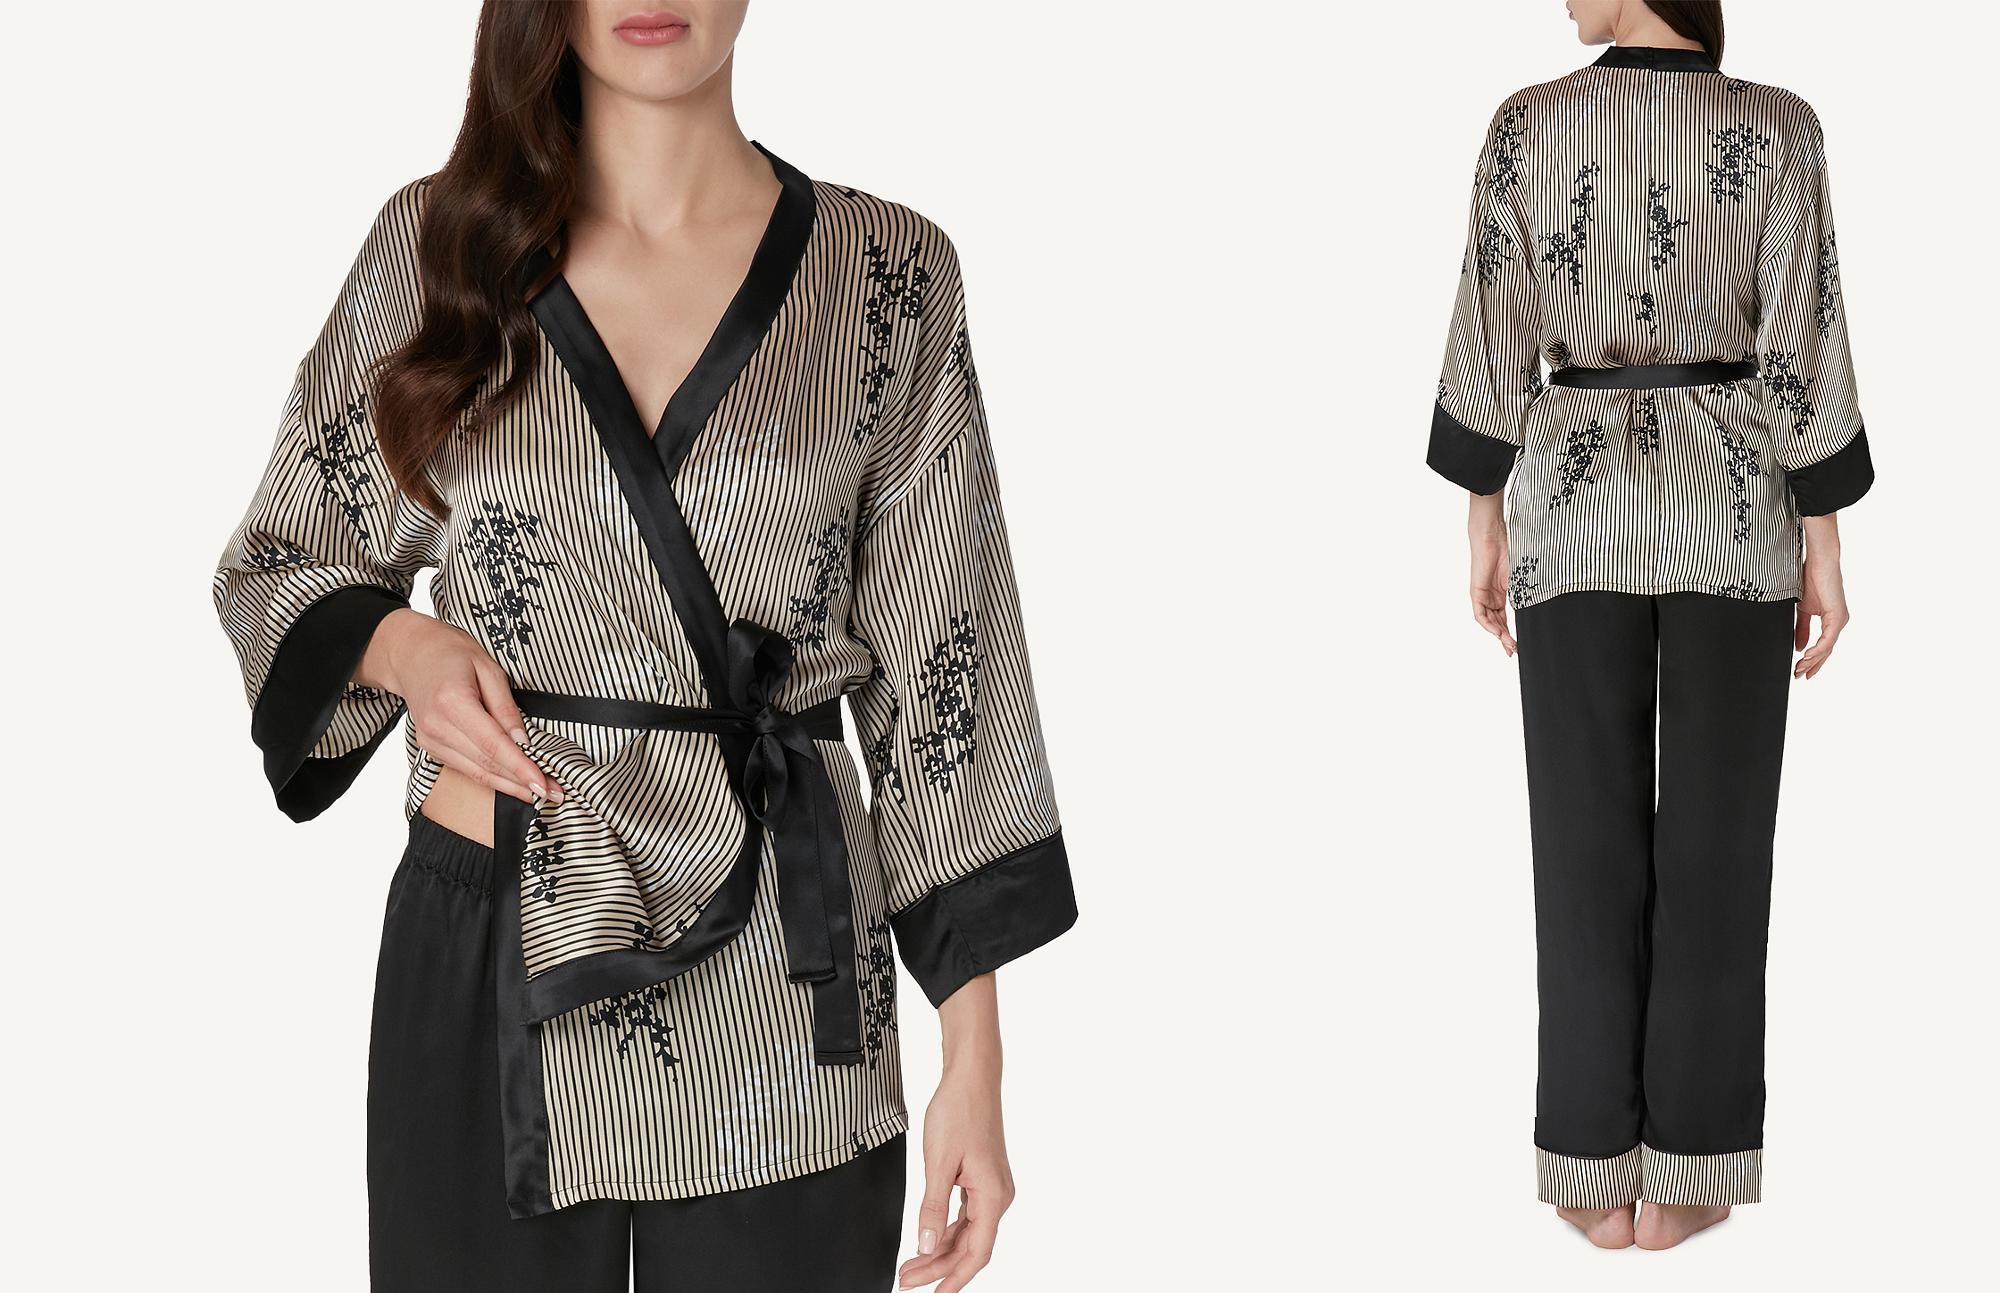 Pigiama Intimissimi con kimono in seta e pantaloni